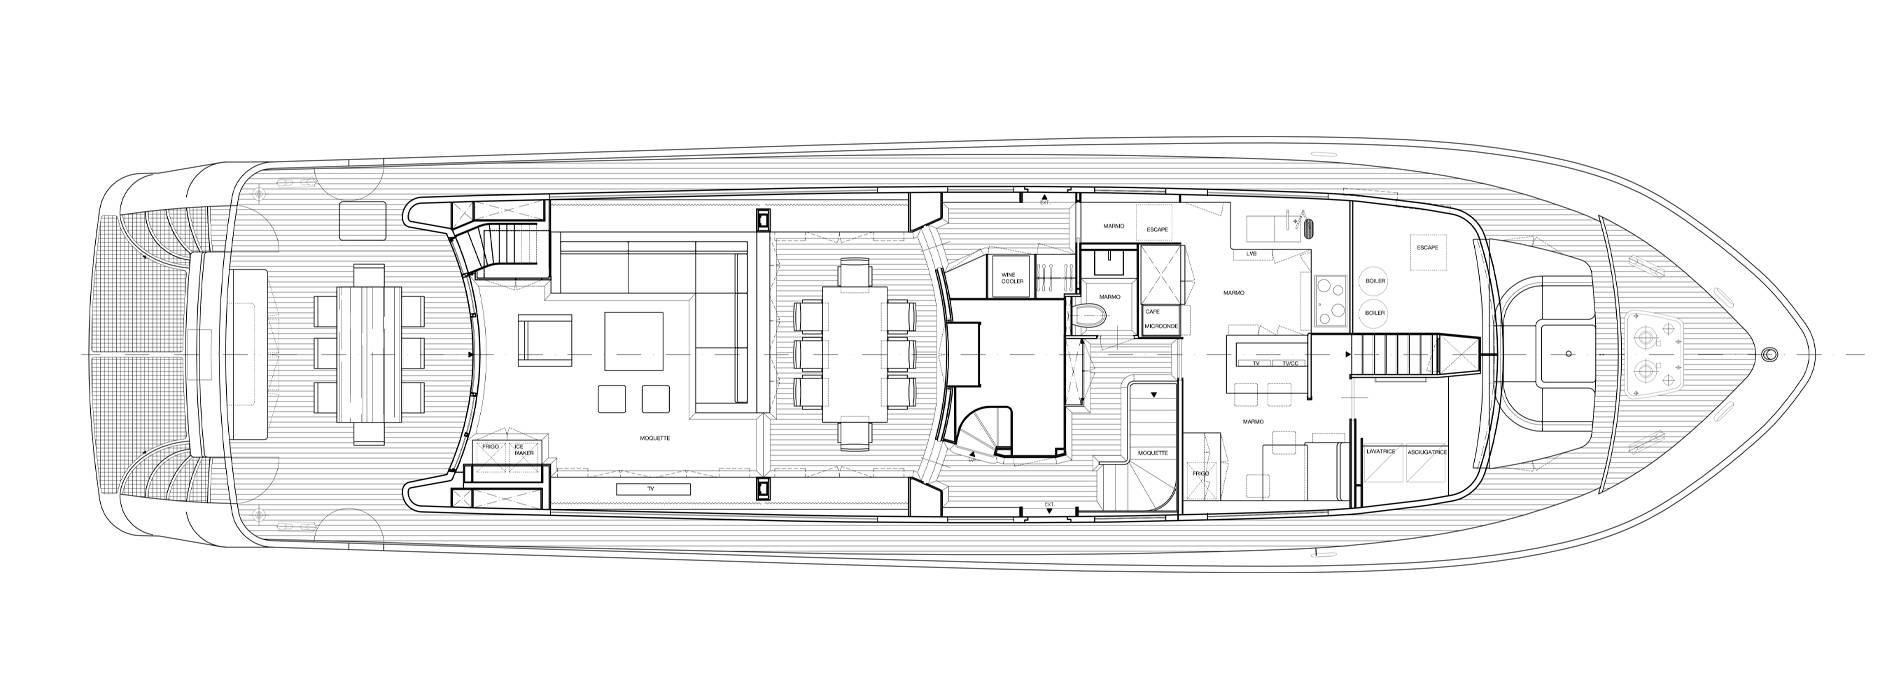 Sanlorenzo Yachts SL88-541 Main deck